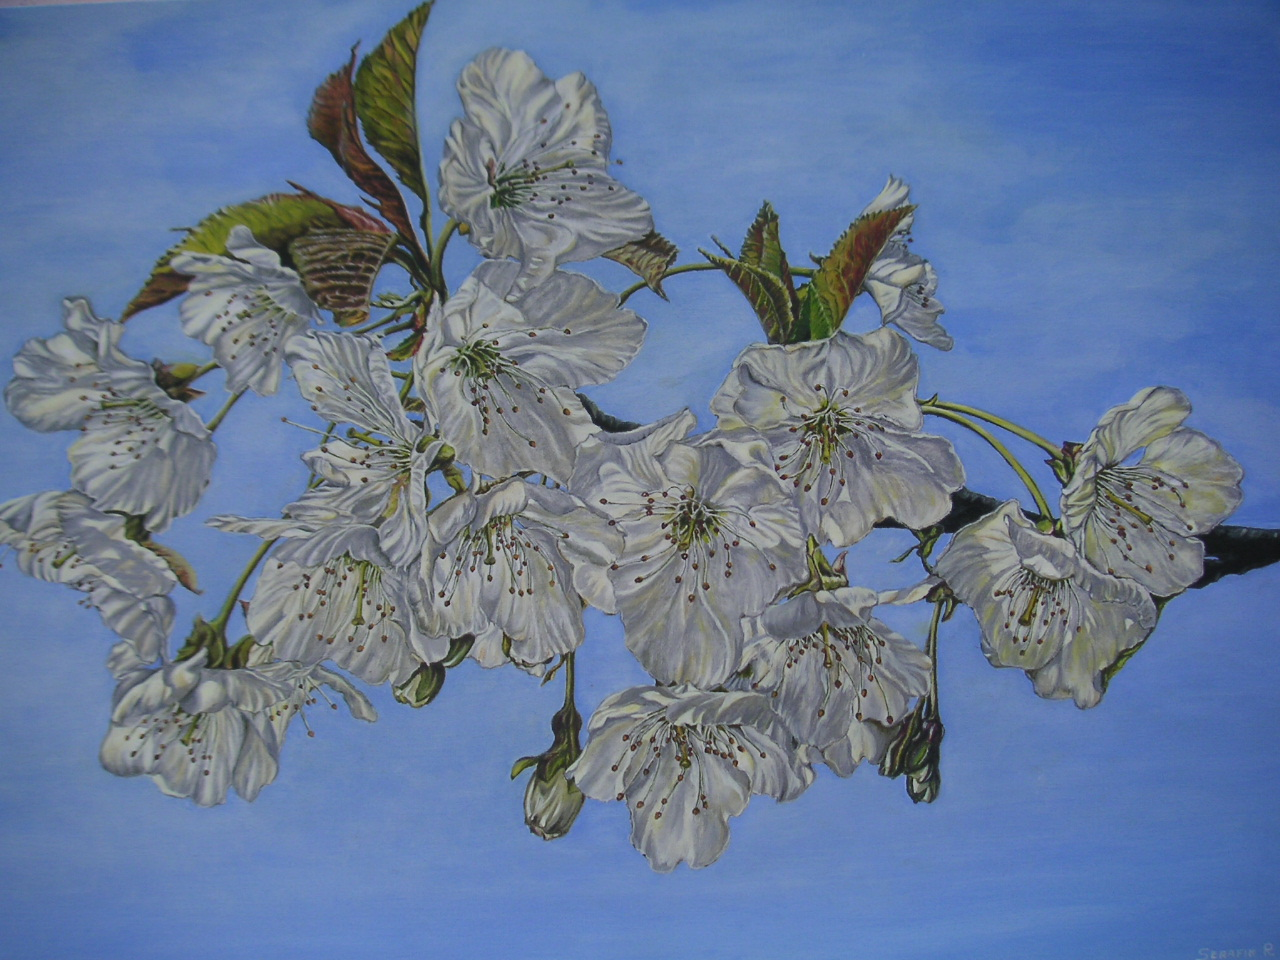 quadri primo album cliccare sopra dipinti serafin